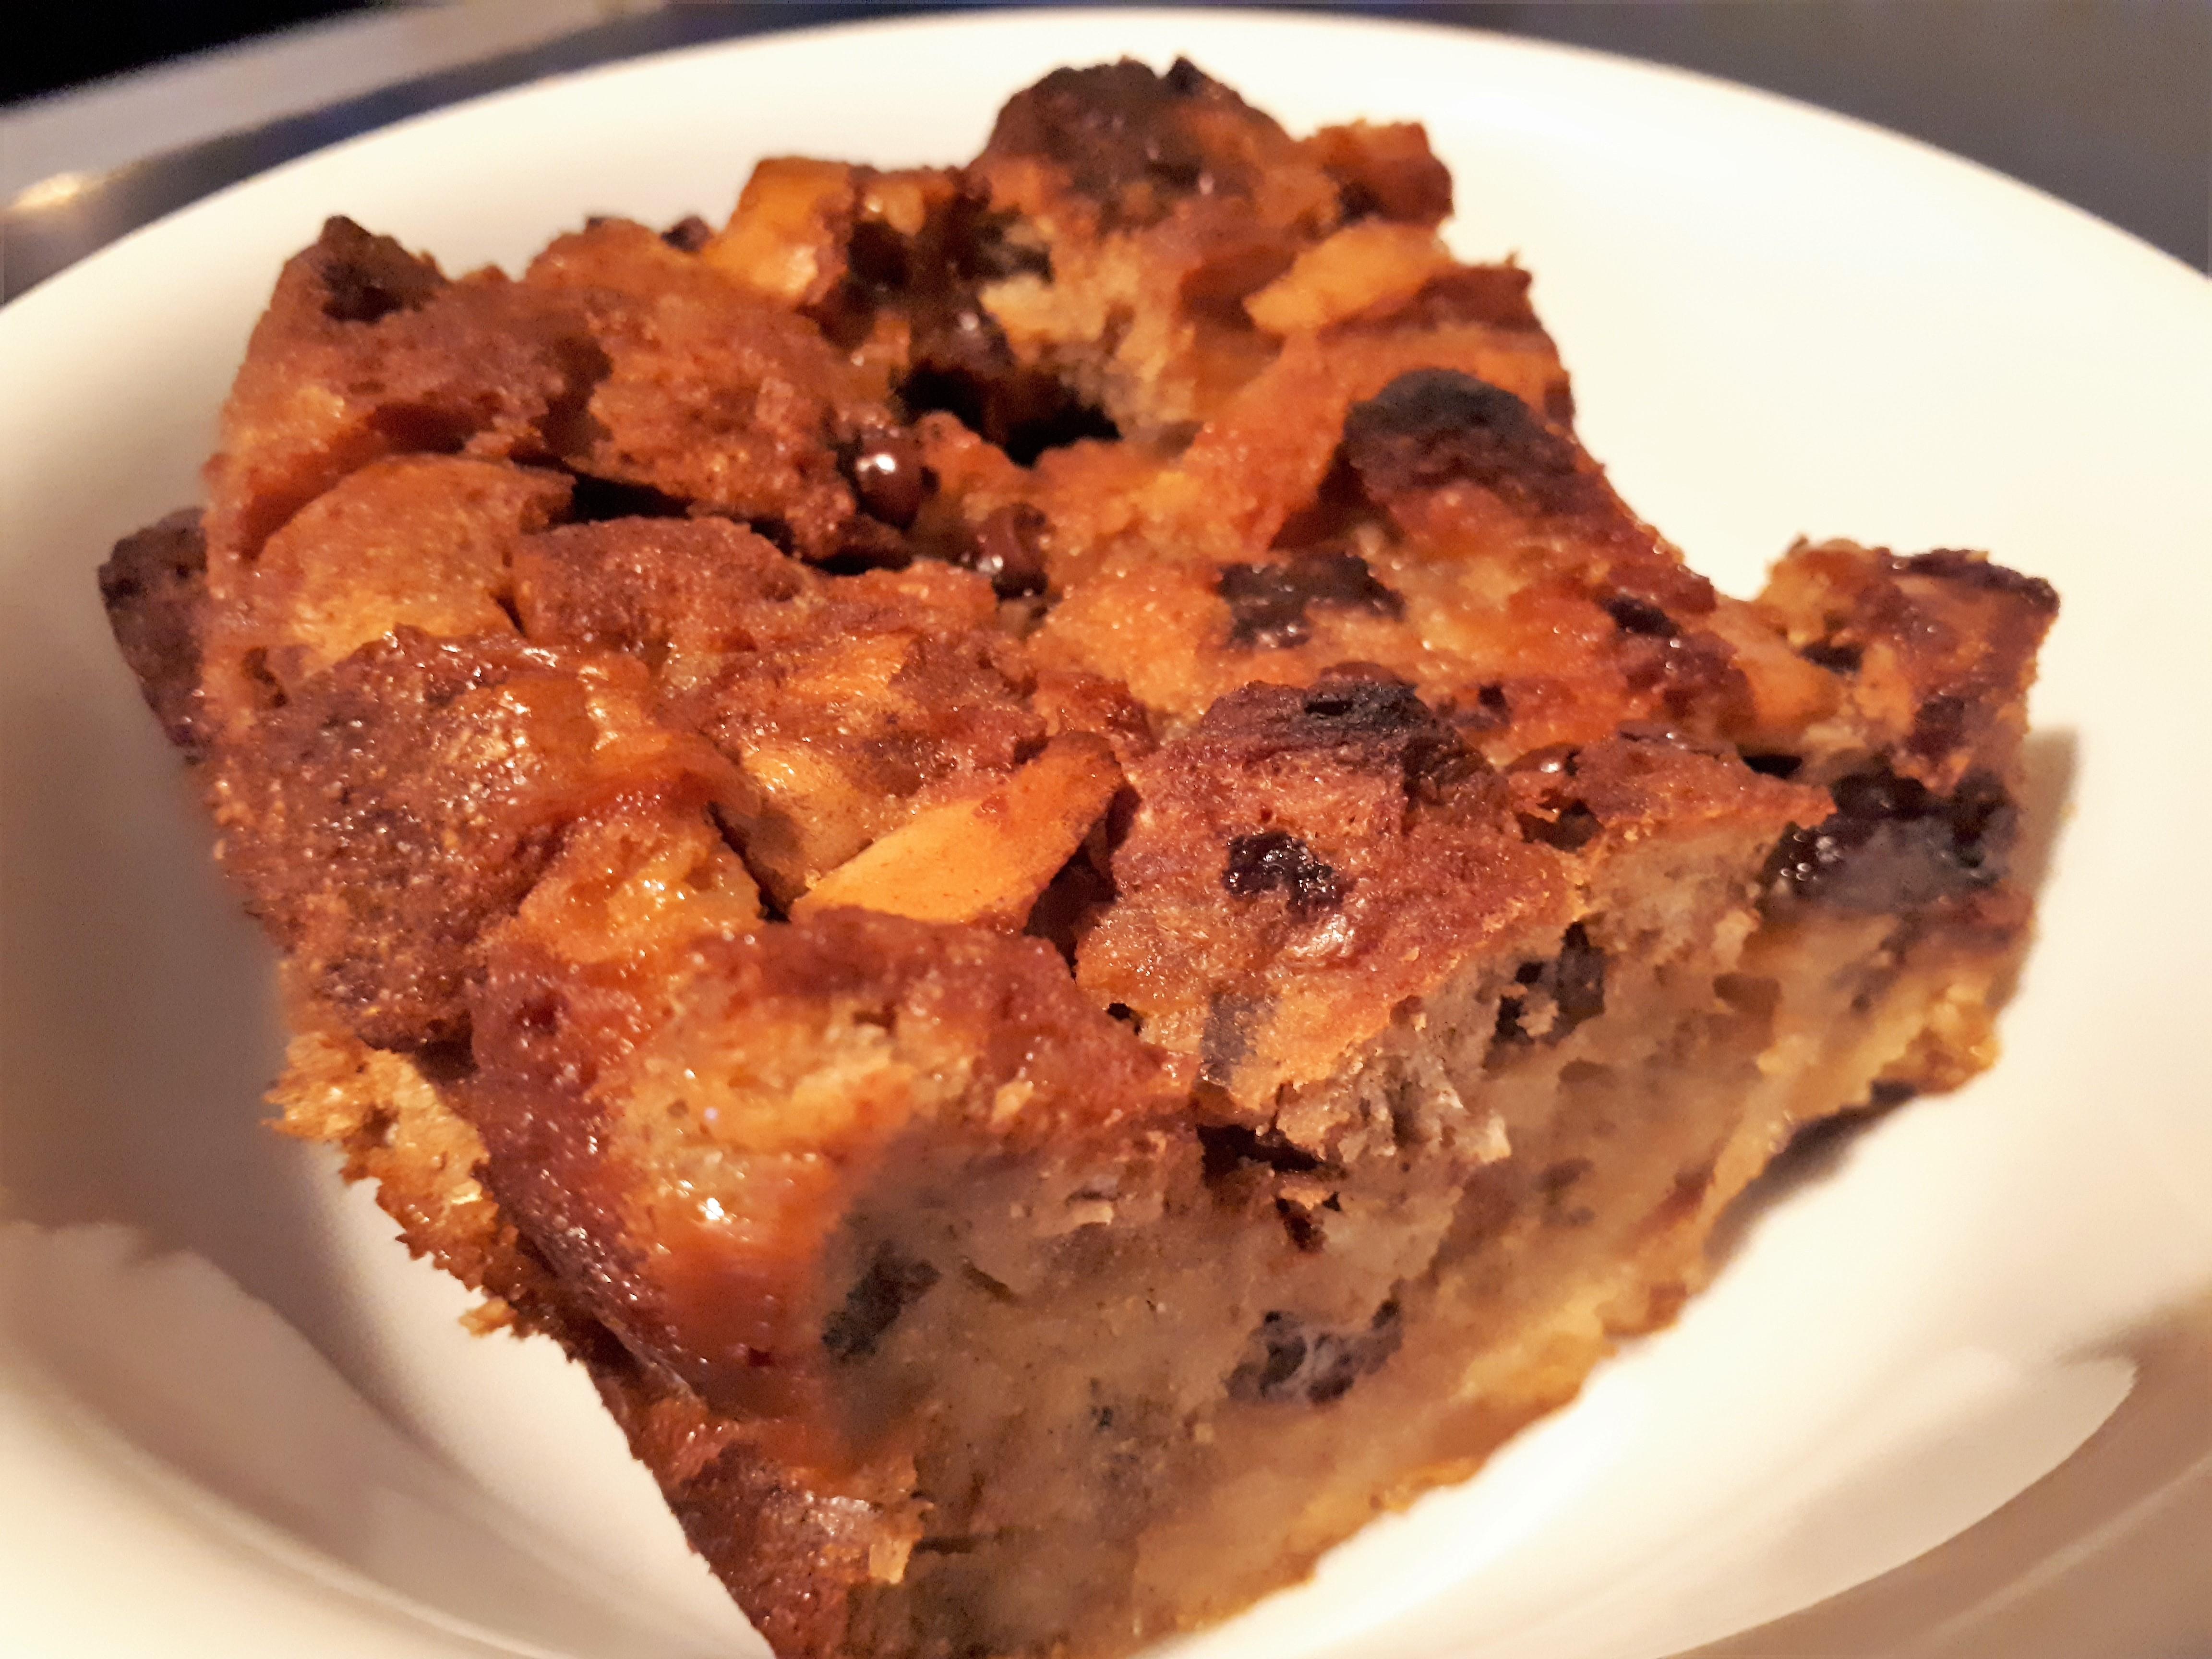 Easy Chocolate Cinnamon Bread Pudding